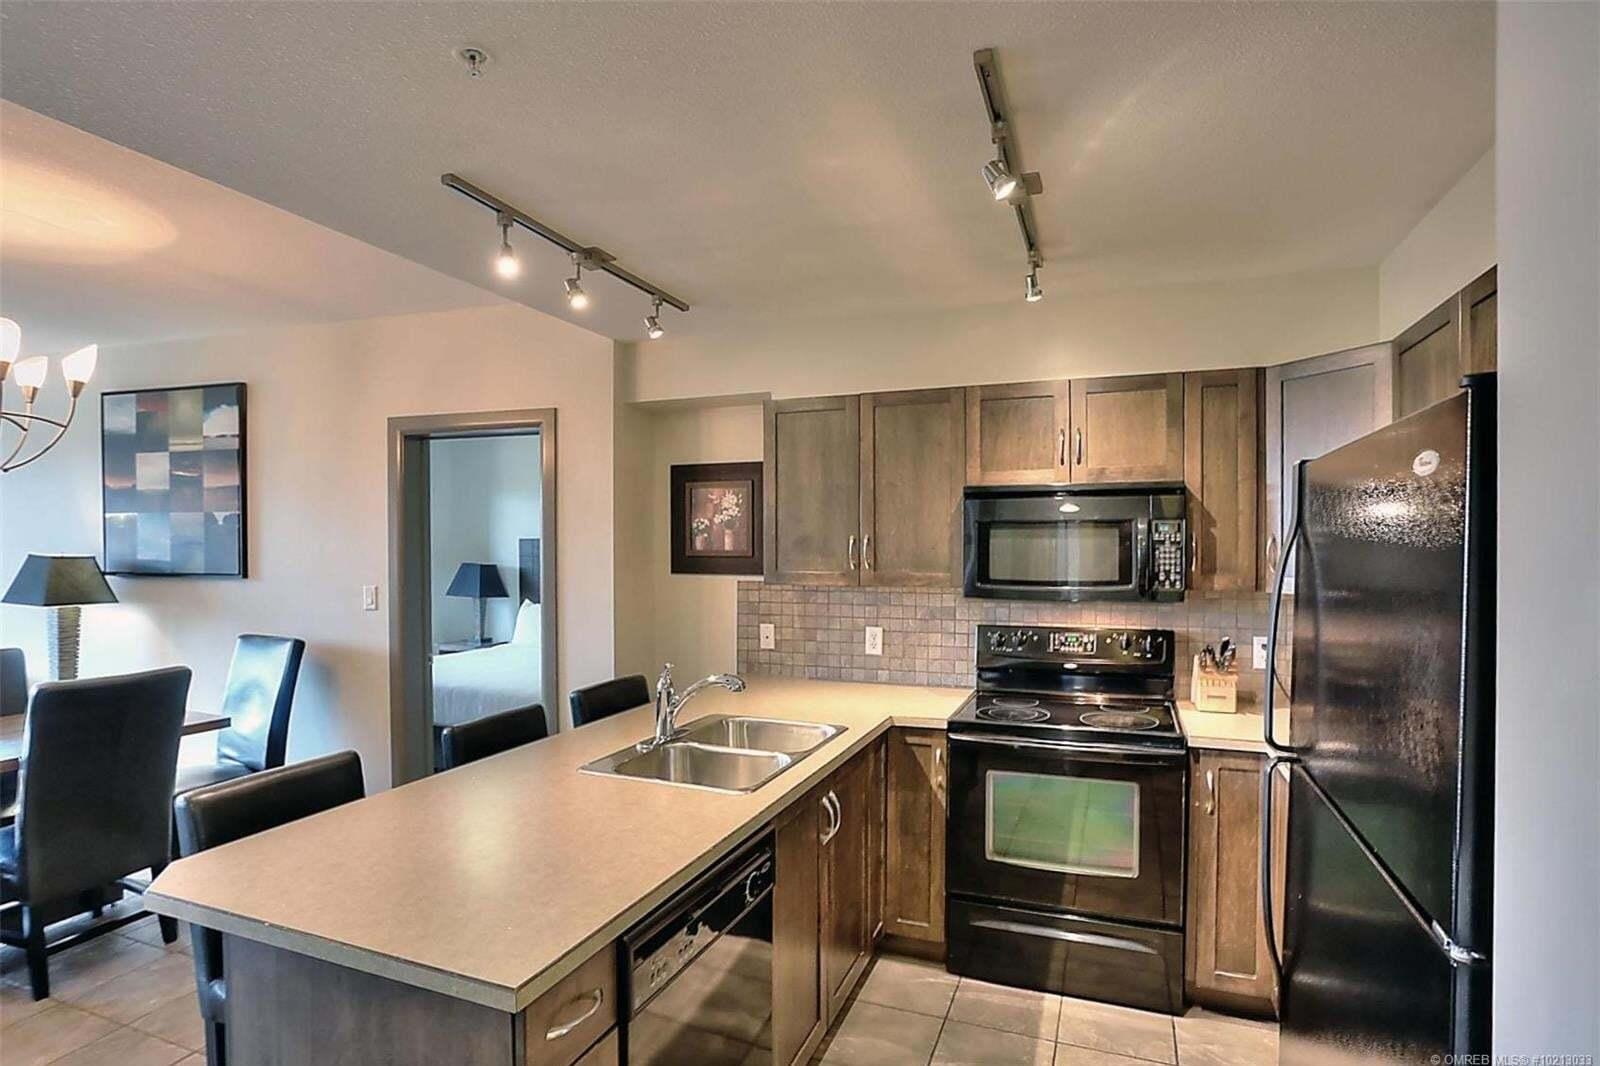 Condo for sale at 654 Cook Rd Kelowna British Columbia - MLS: 10213033